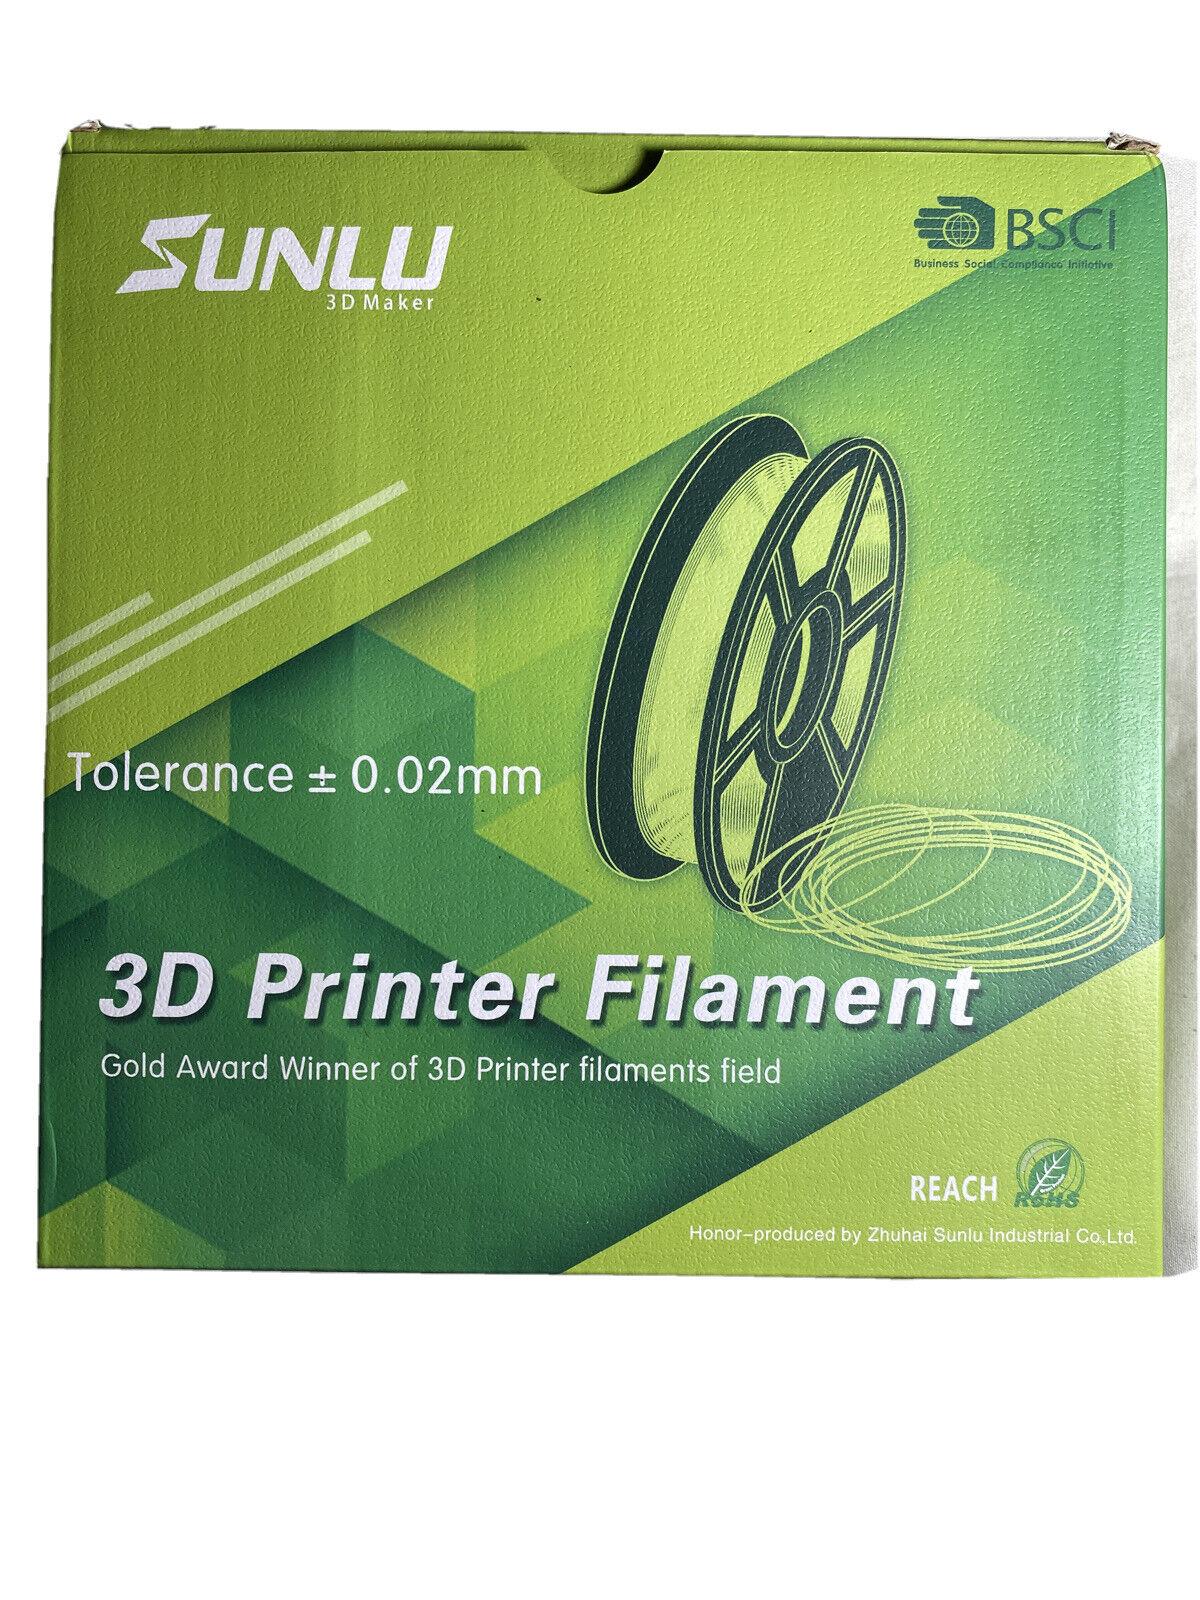 SUNLU PLA White Filament 1.75mm 3D Printer Filament, 1KG 2.2 LBS Open Box